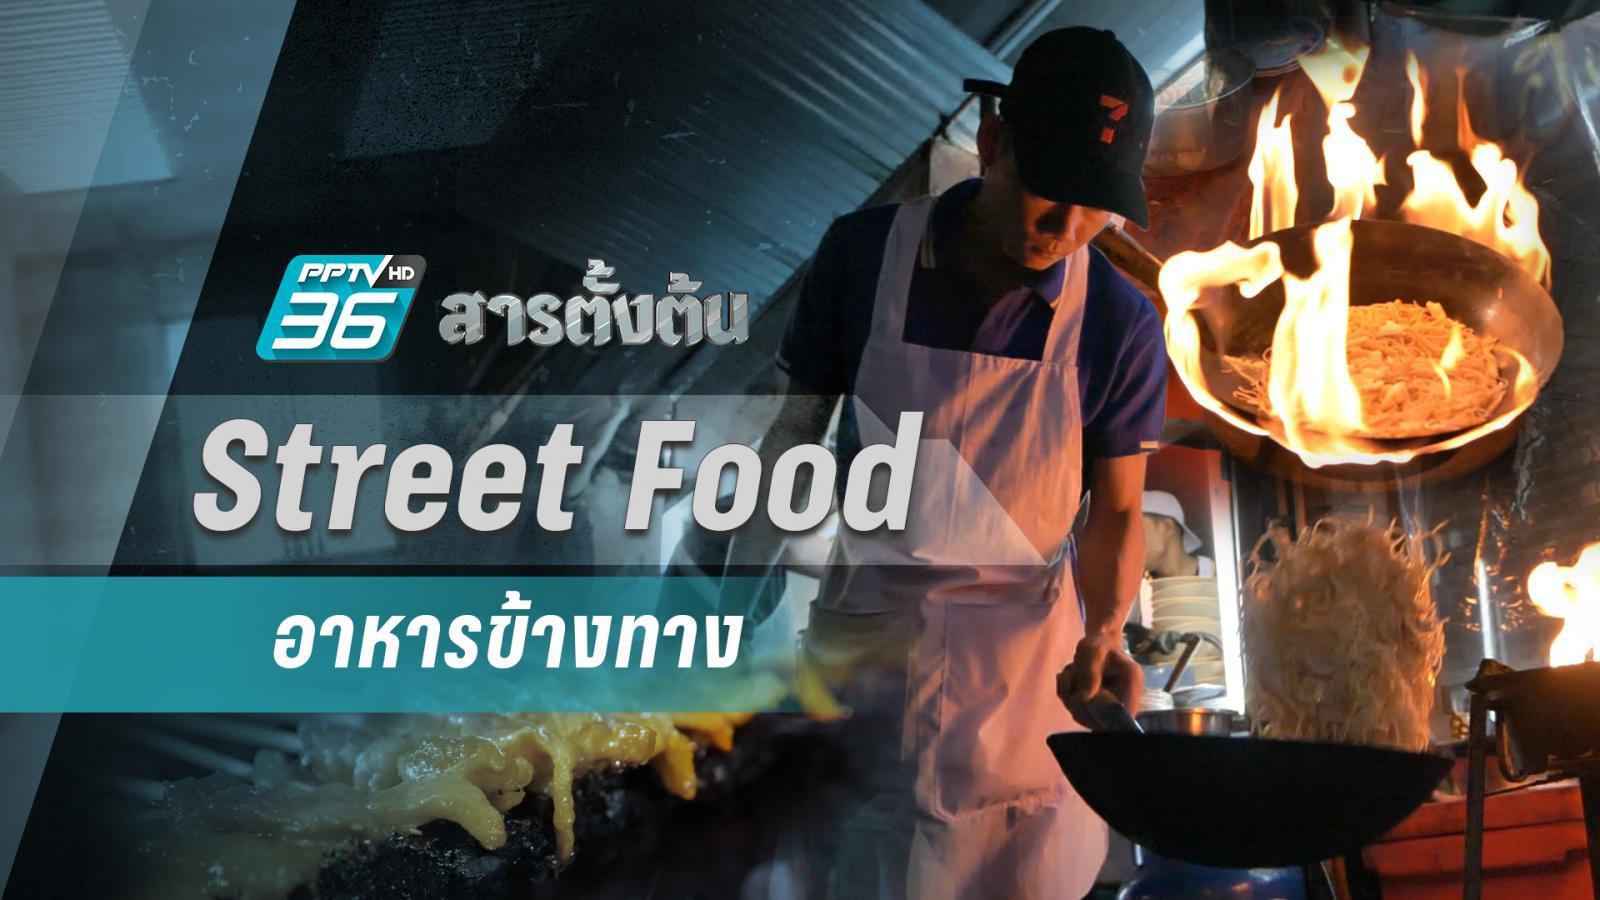 Street Food  อาหารข้างทาง